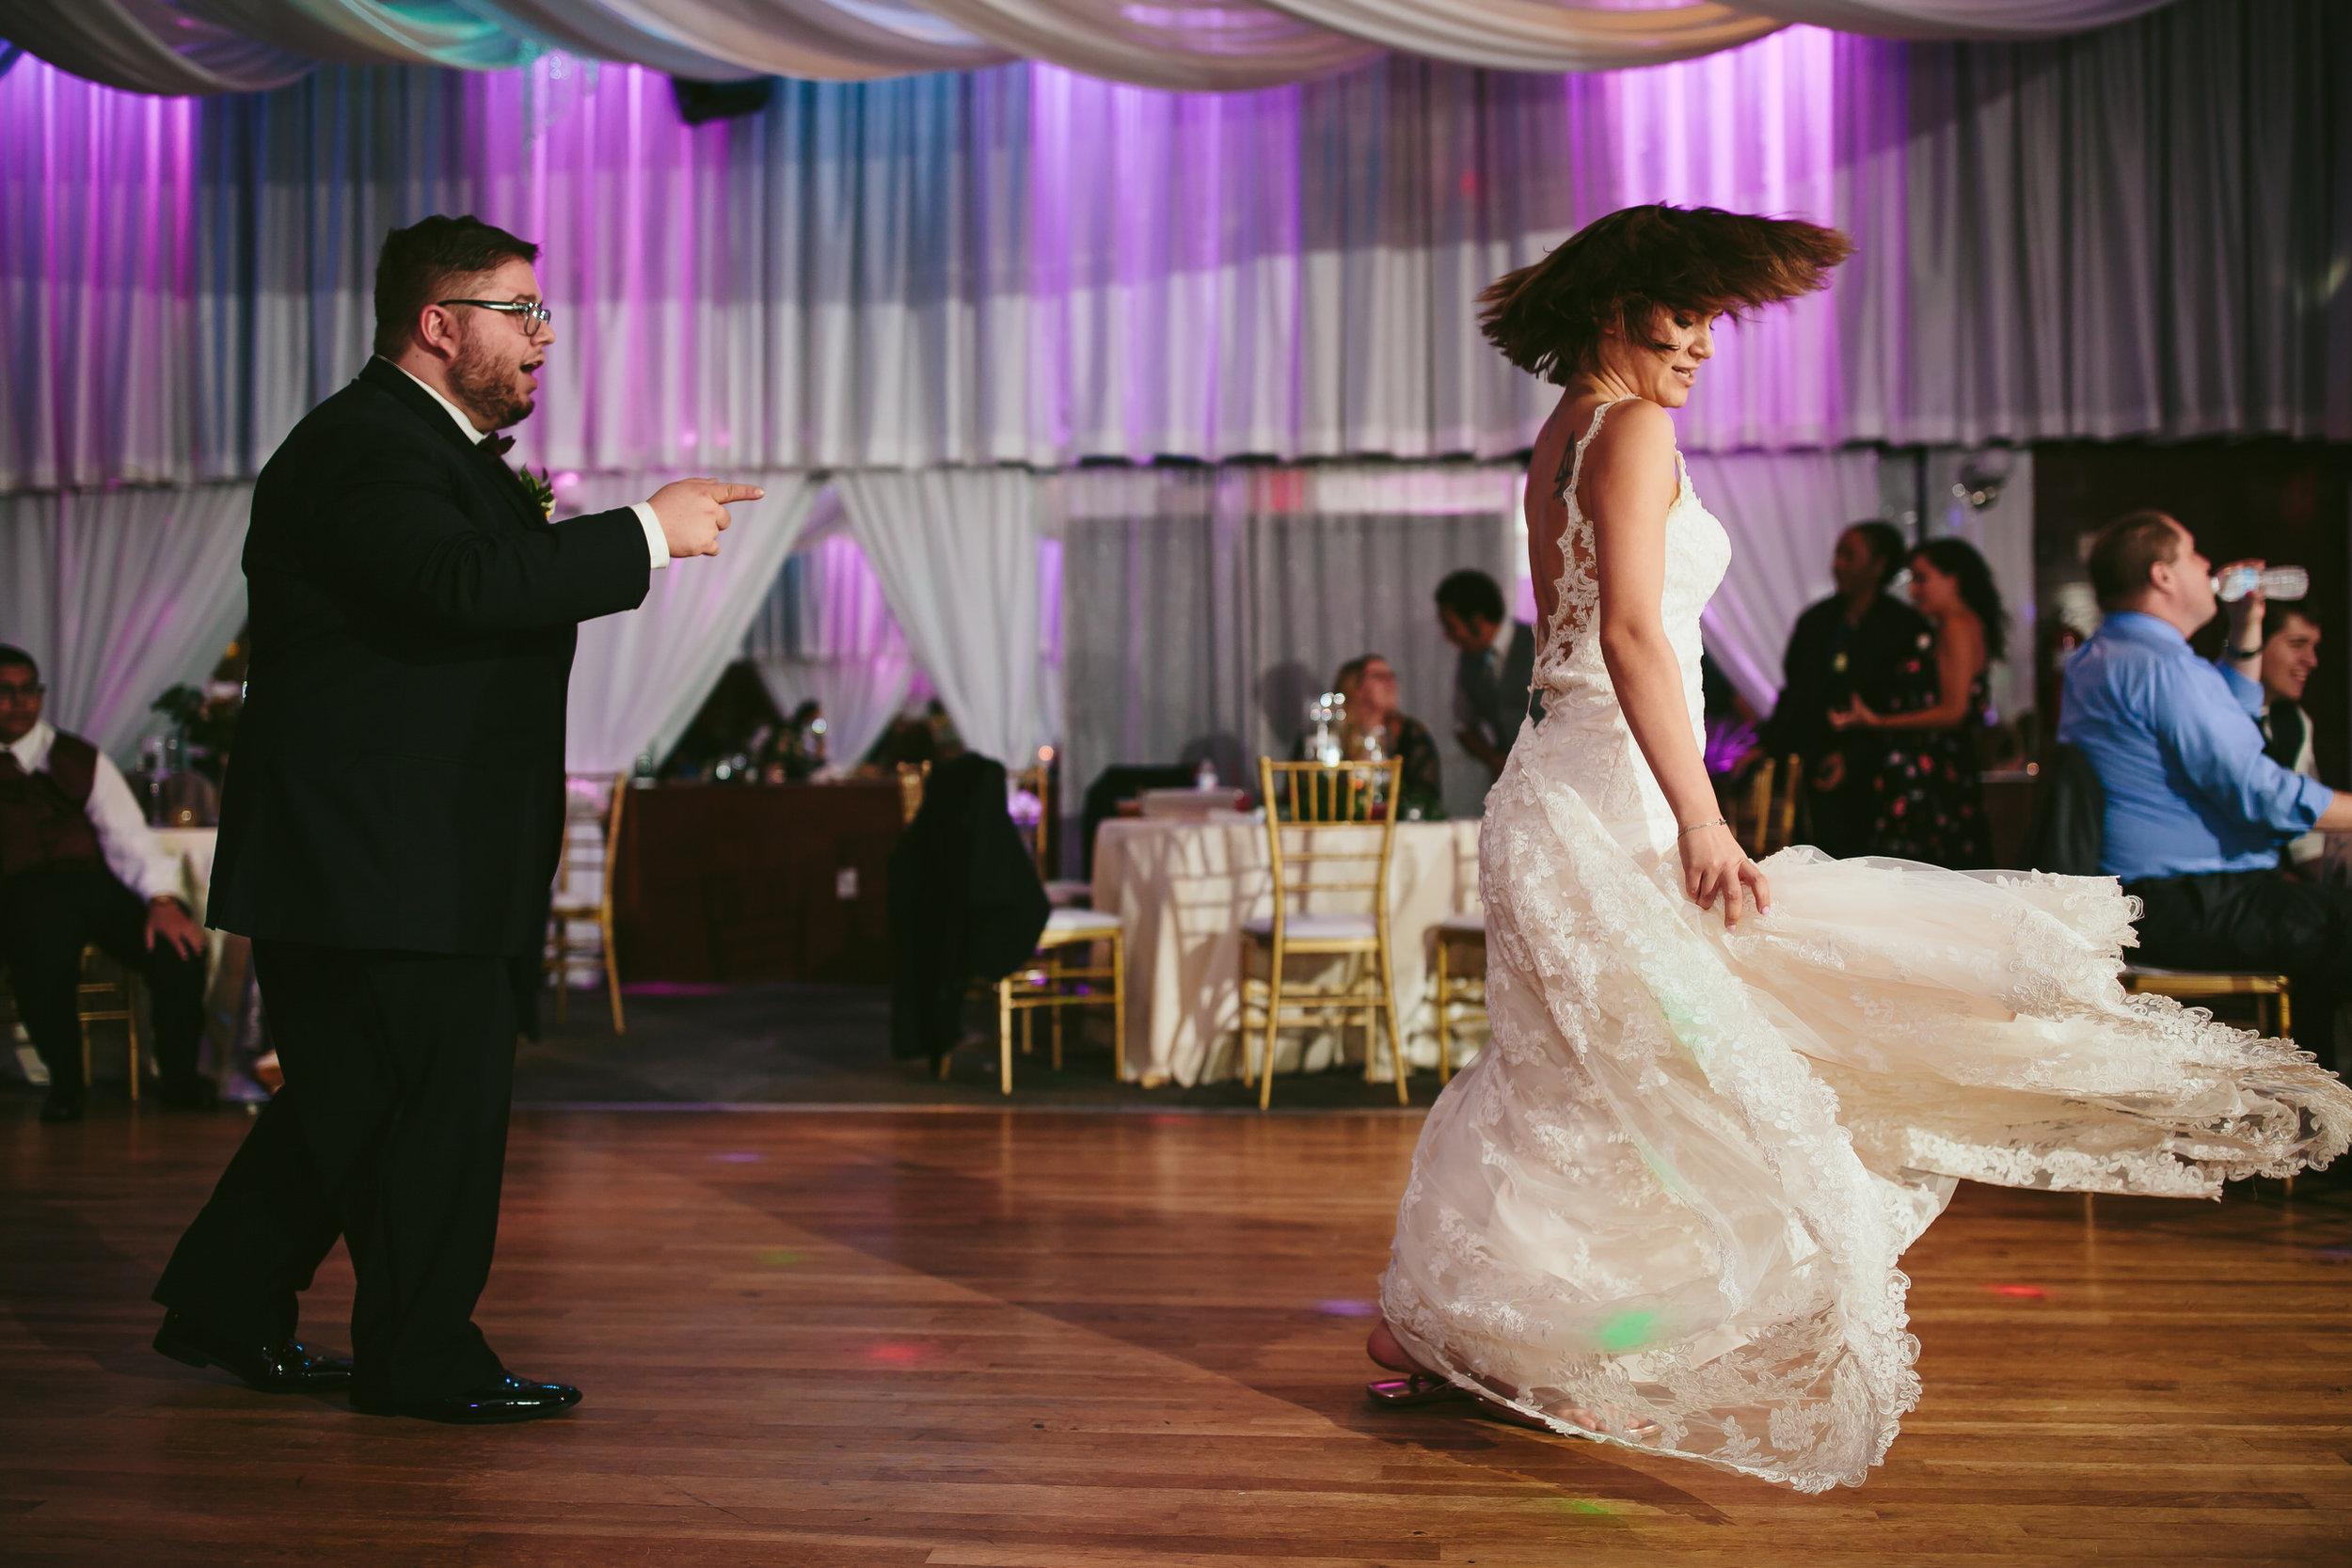 bride_man_of_honor_tiny_house_photo_best_friends_weddings.jpg